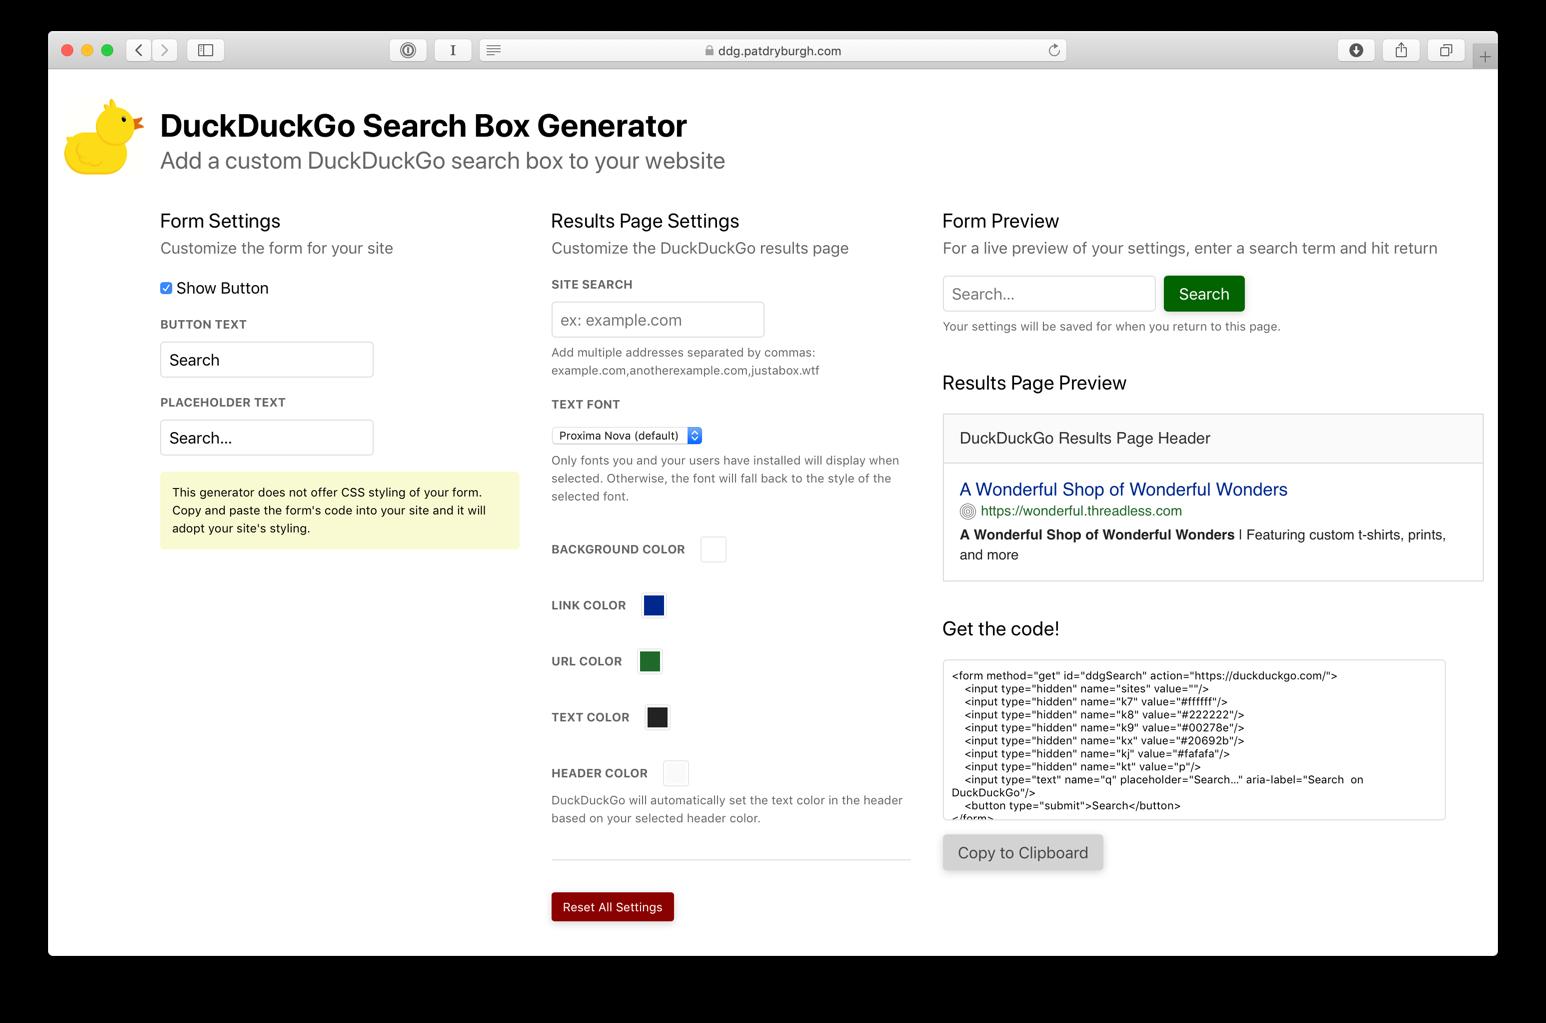 Screenshot of DuckDuckGo Search Box Generator